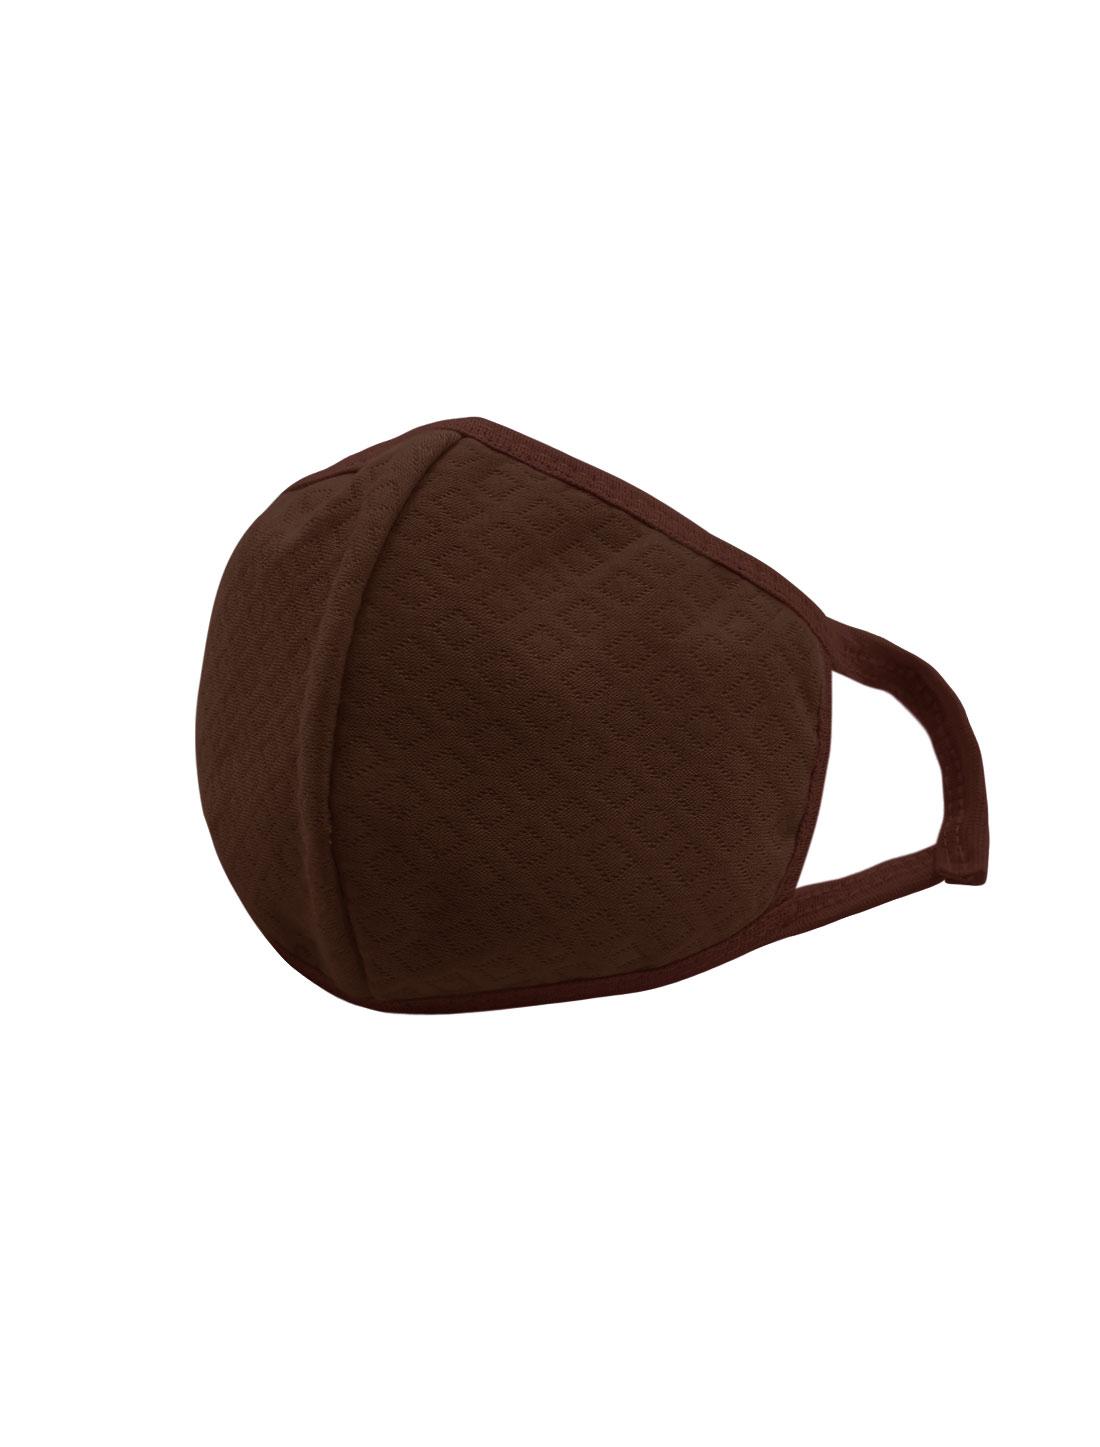 Unisex Elastic Earloops Argyle Design Anti-dust Mouth Mask Coffee